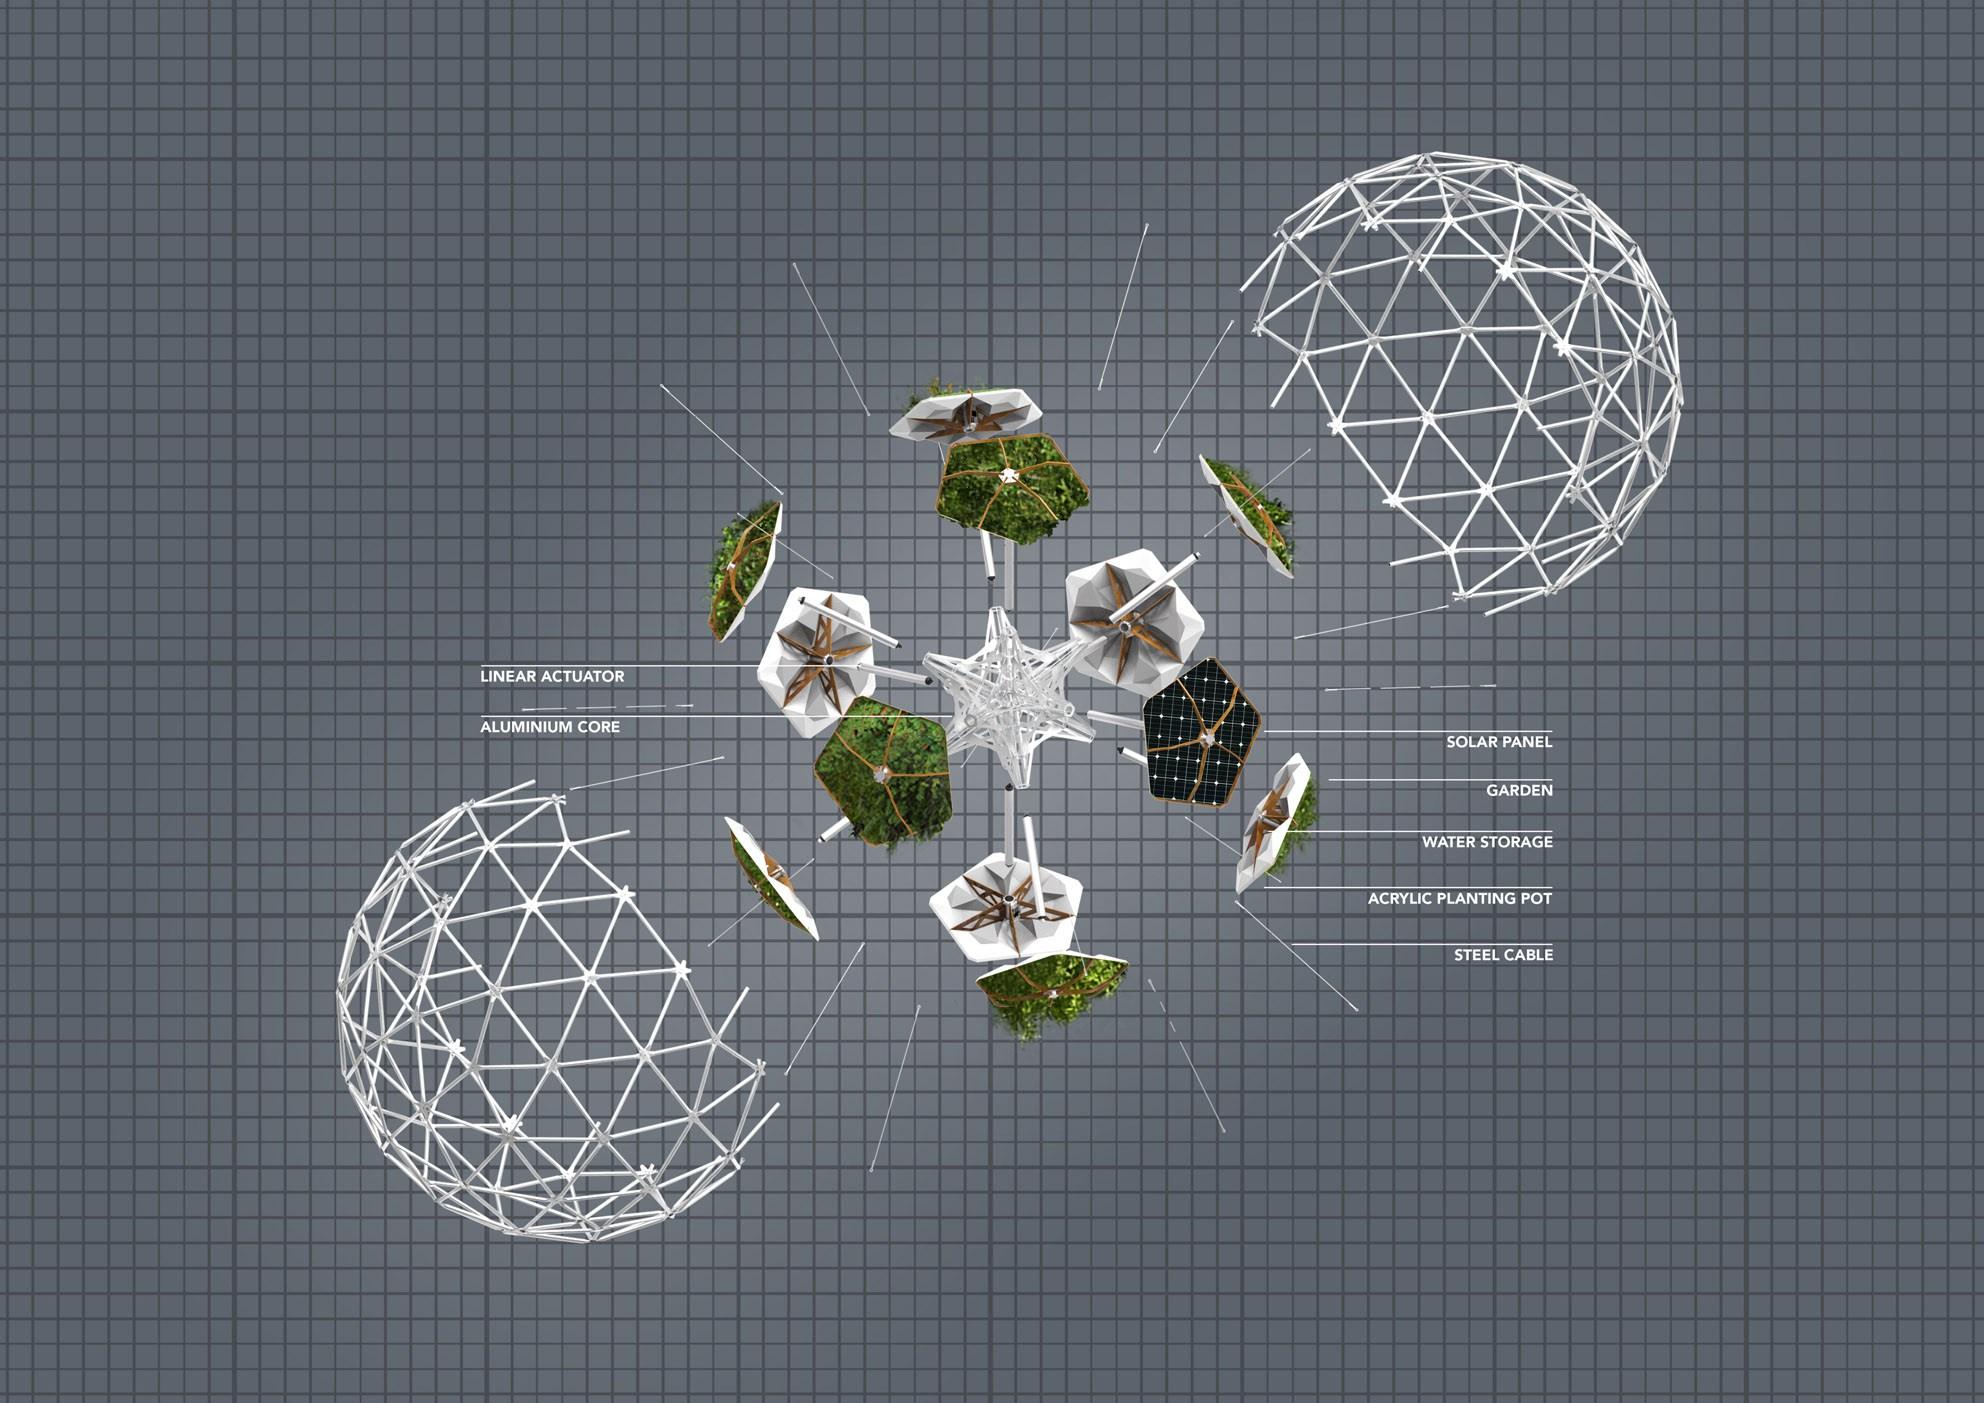 Imagen explicativa del proyecto Hortum Machina B - Foto: www.interactivearchitecture.org